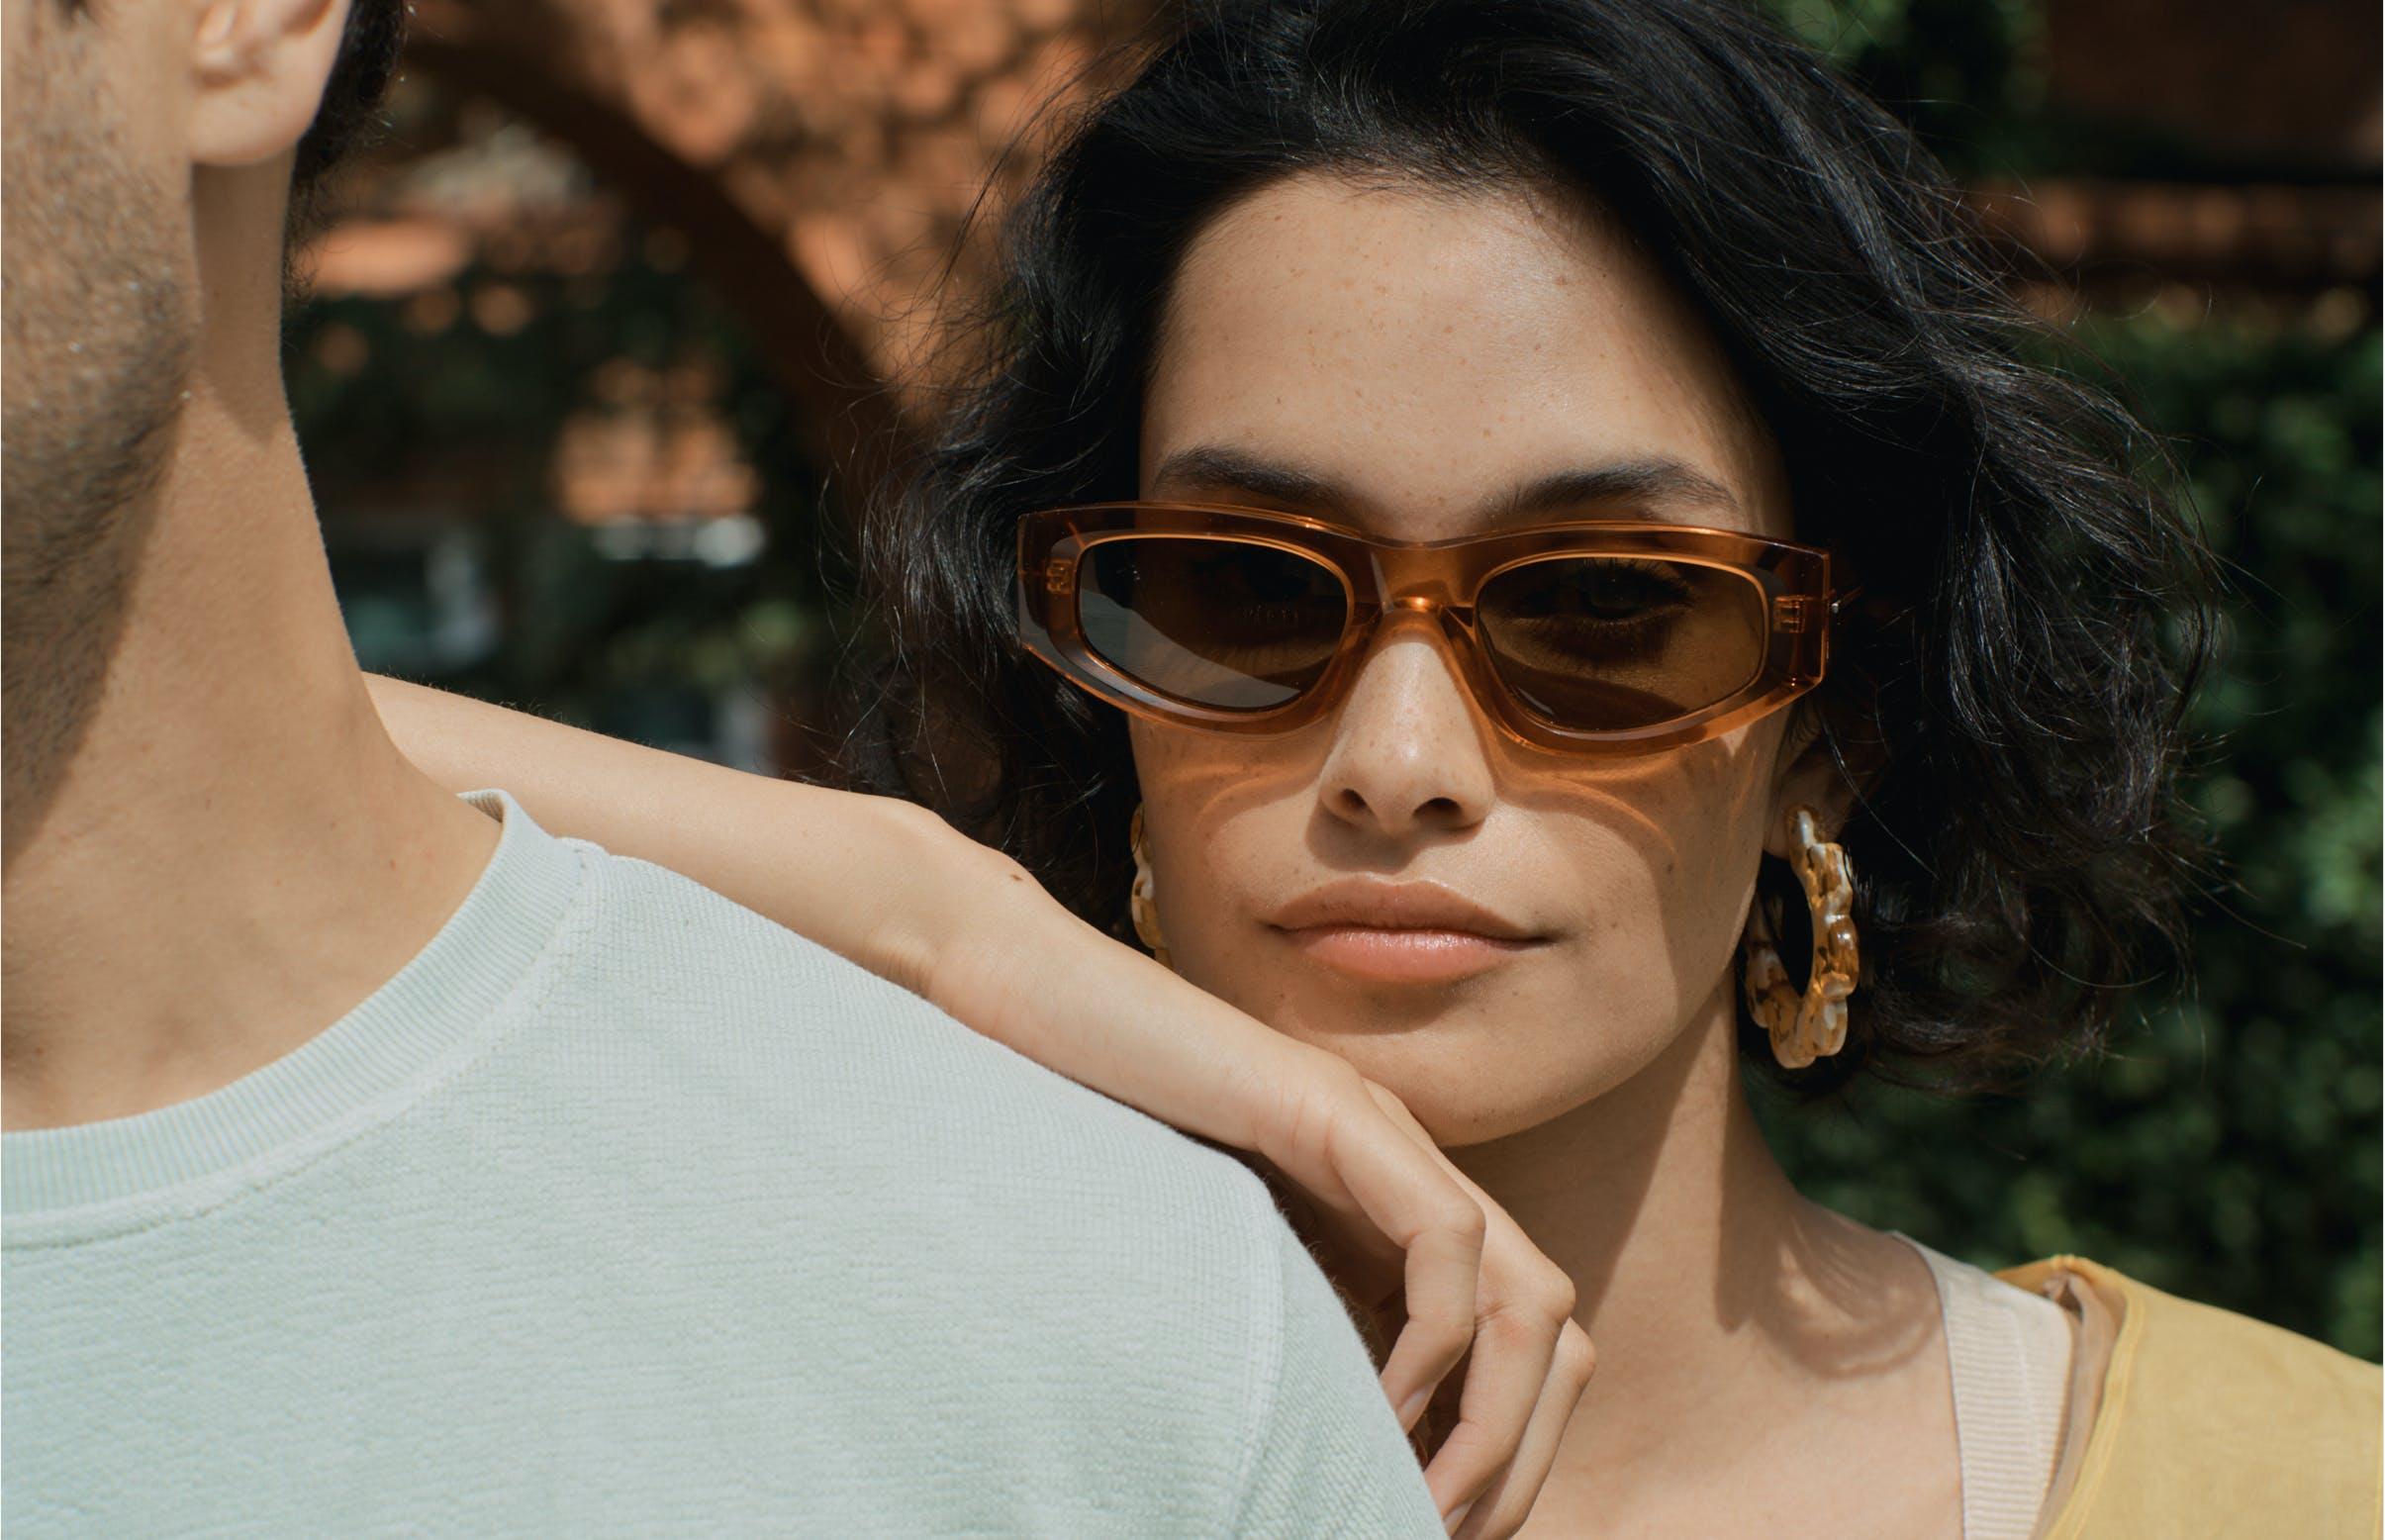 Woman leaning against man's shoulder wearing Gartner sunglasses